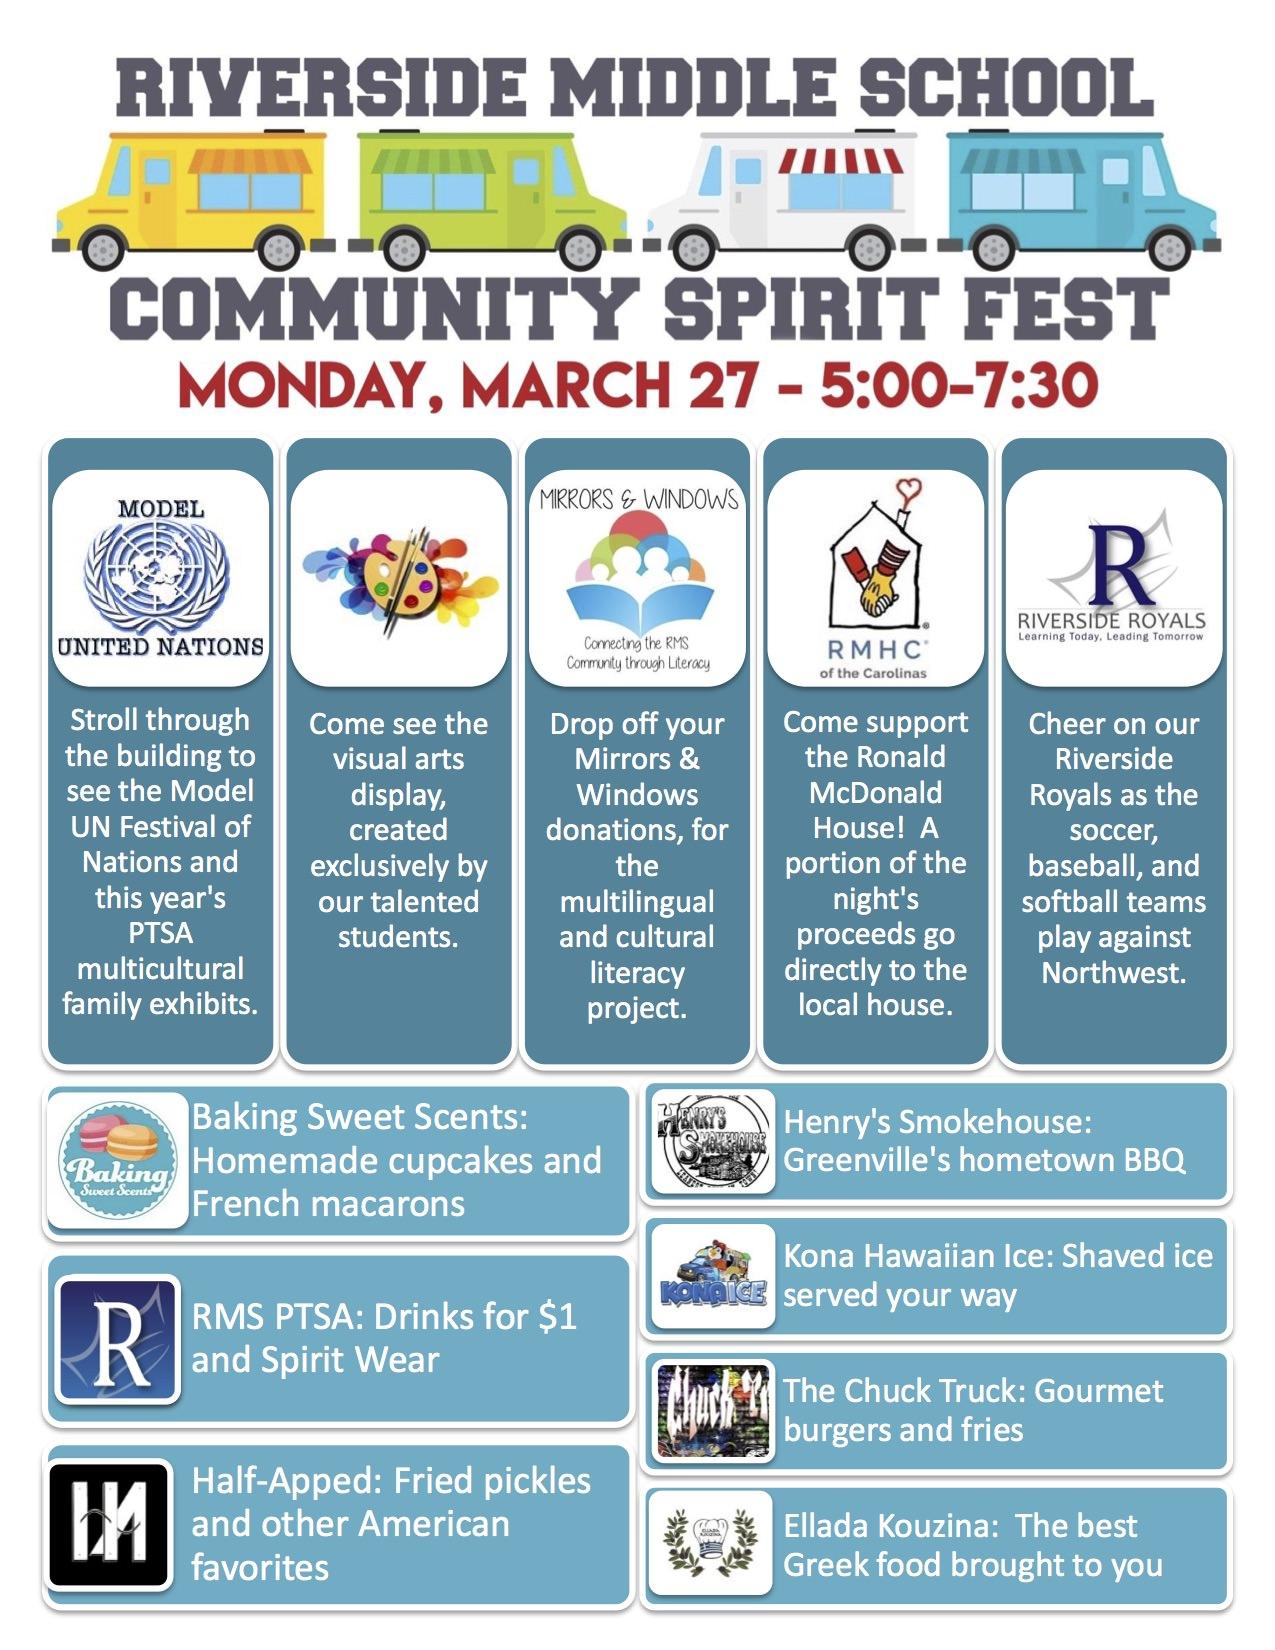 Community Spirit Fest